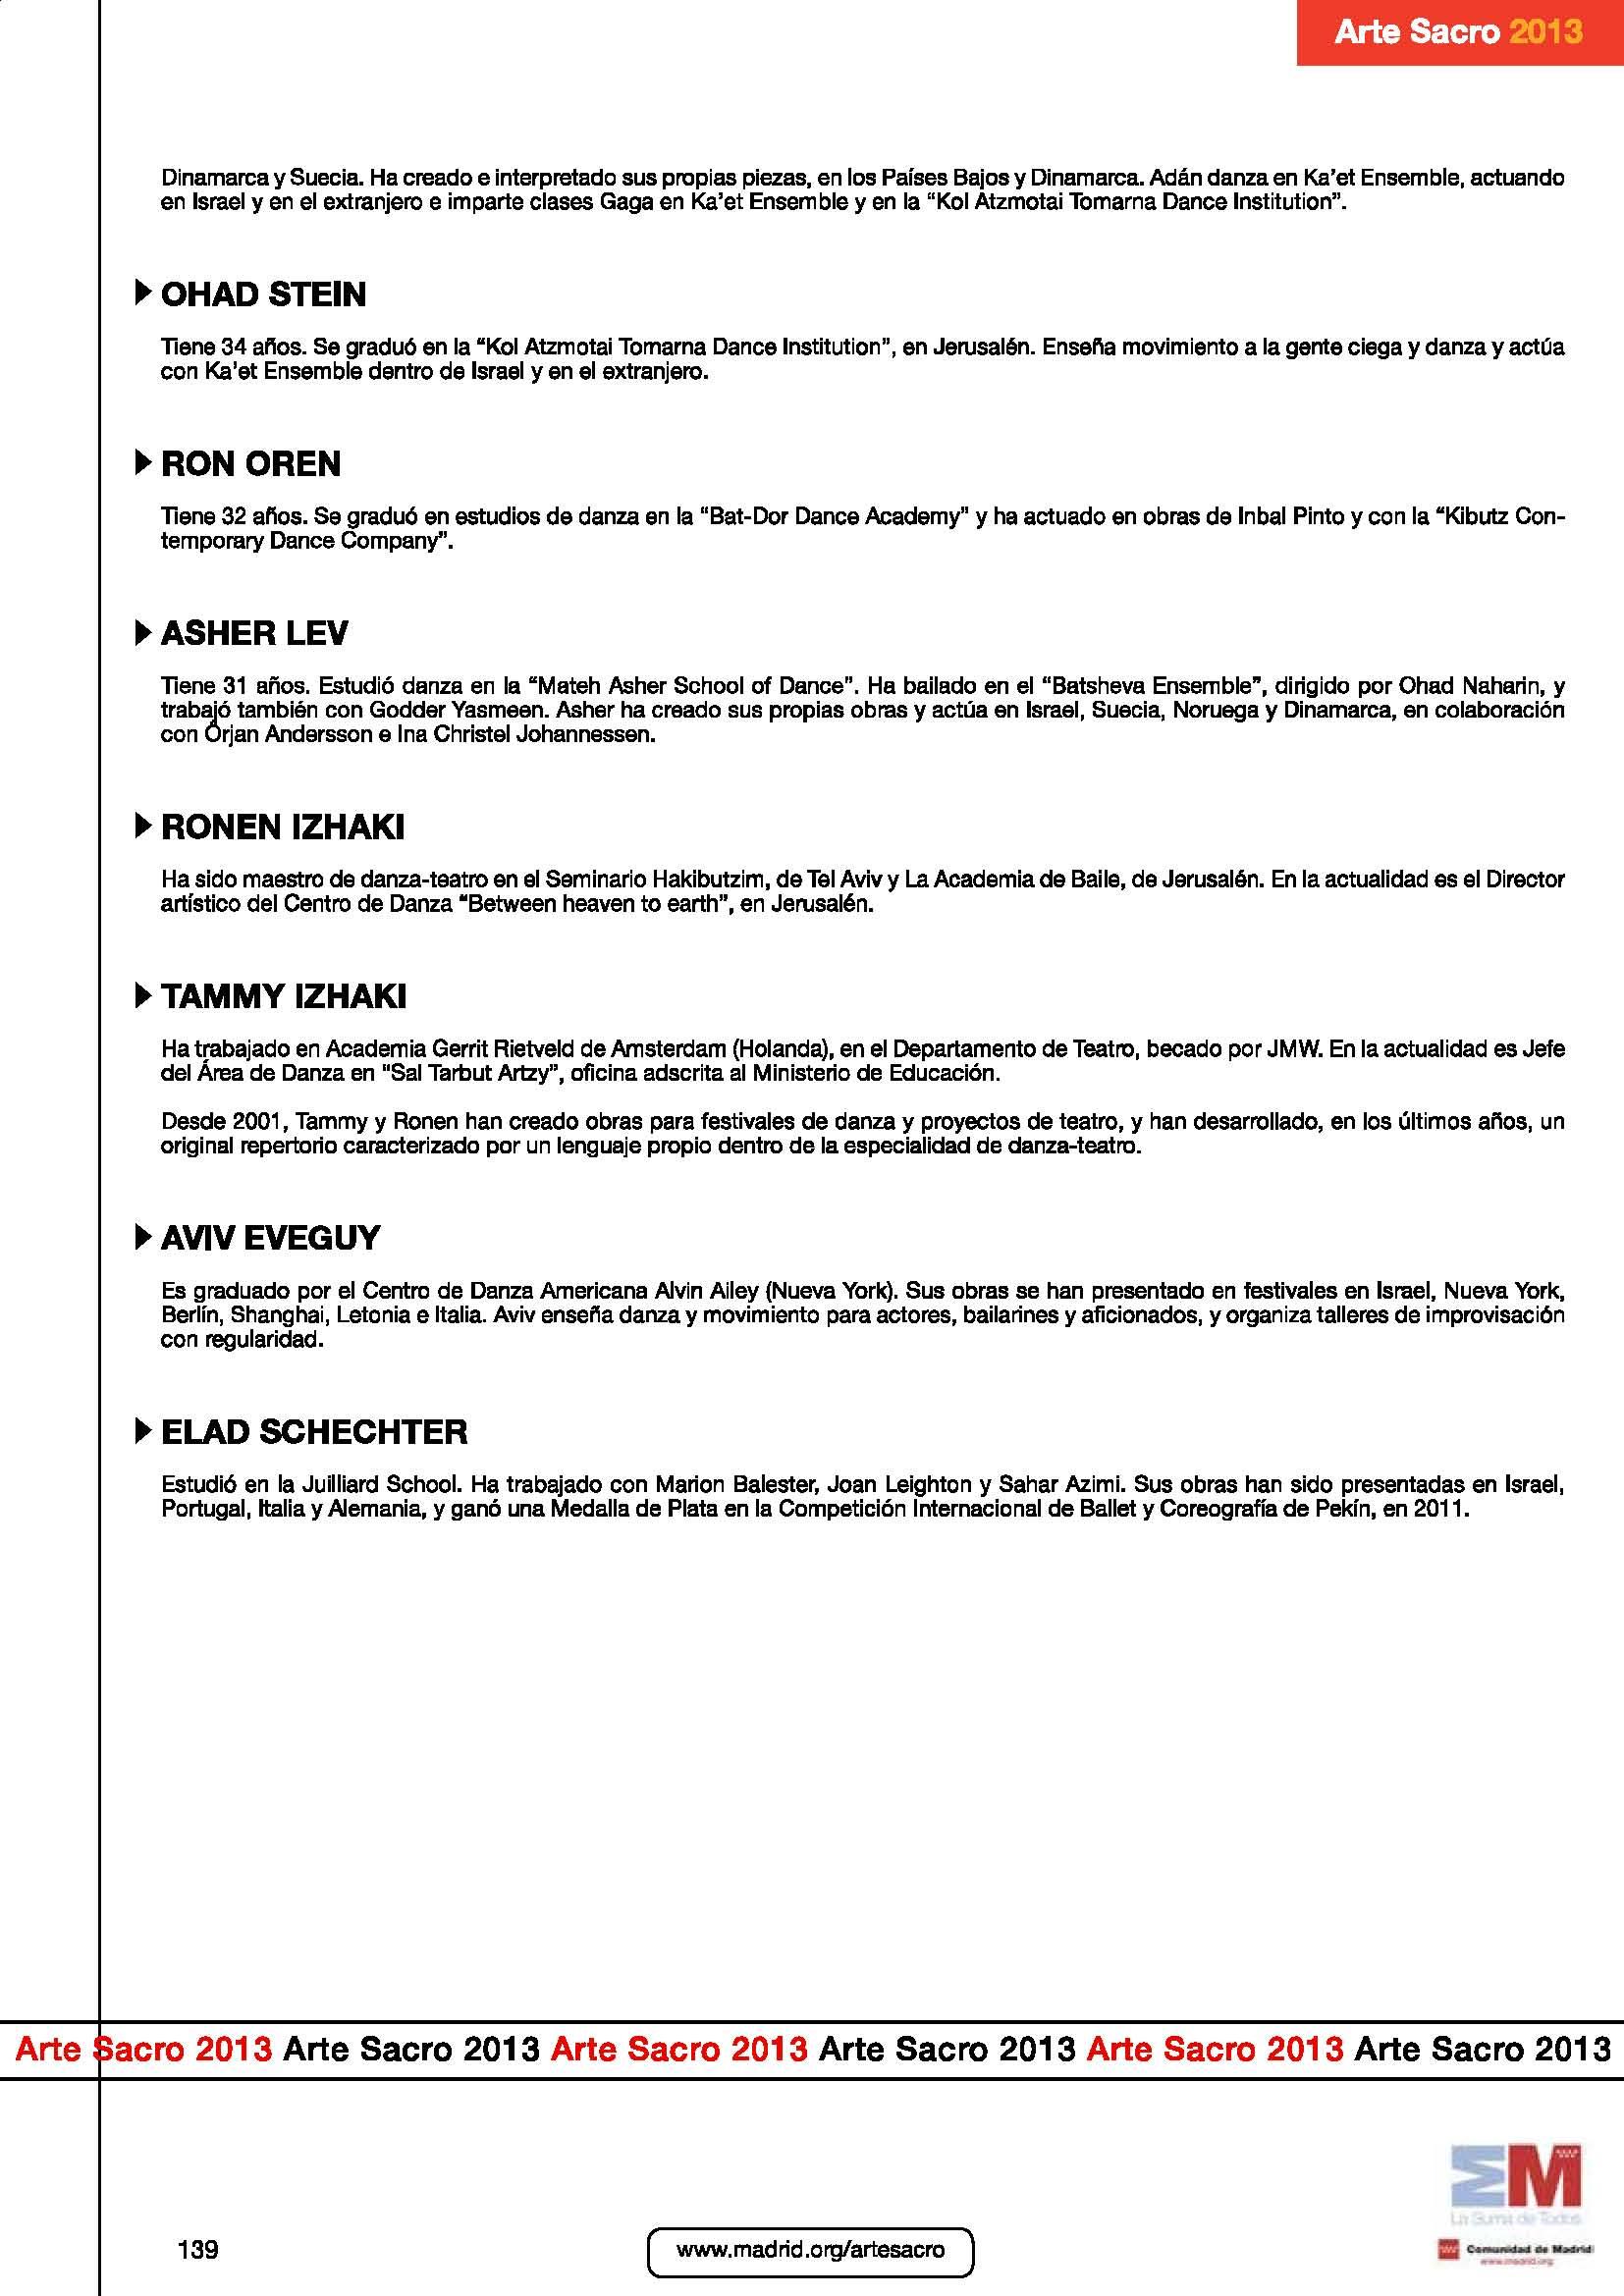 dossier_completo_Página_139